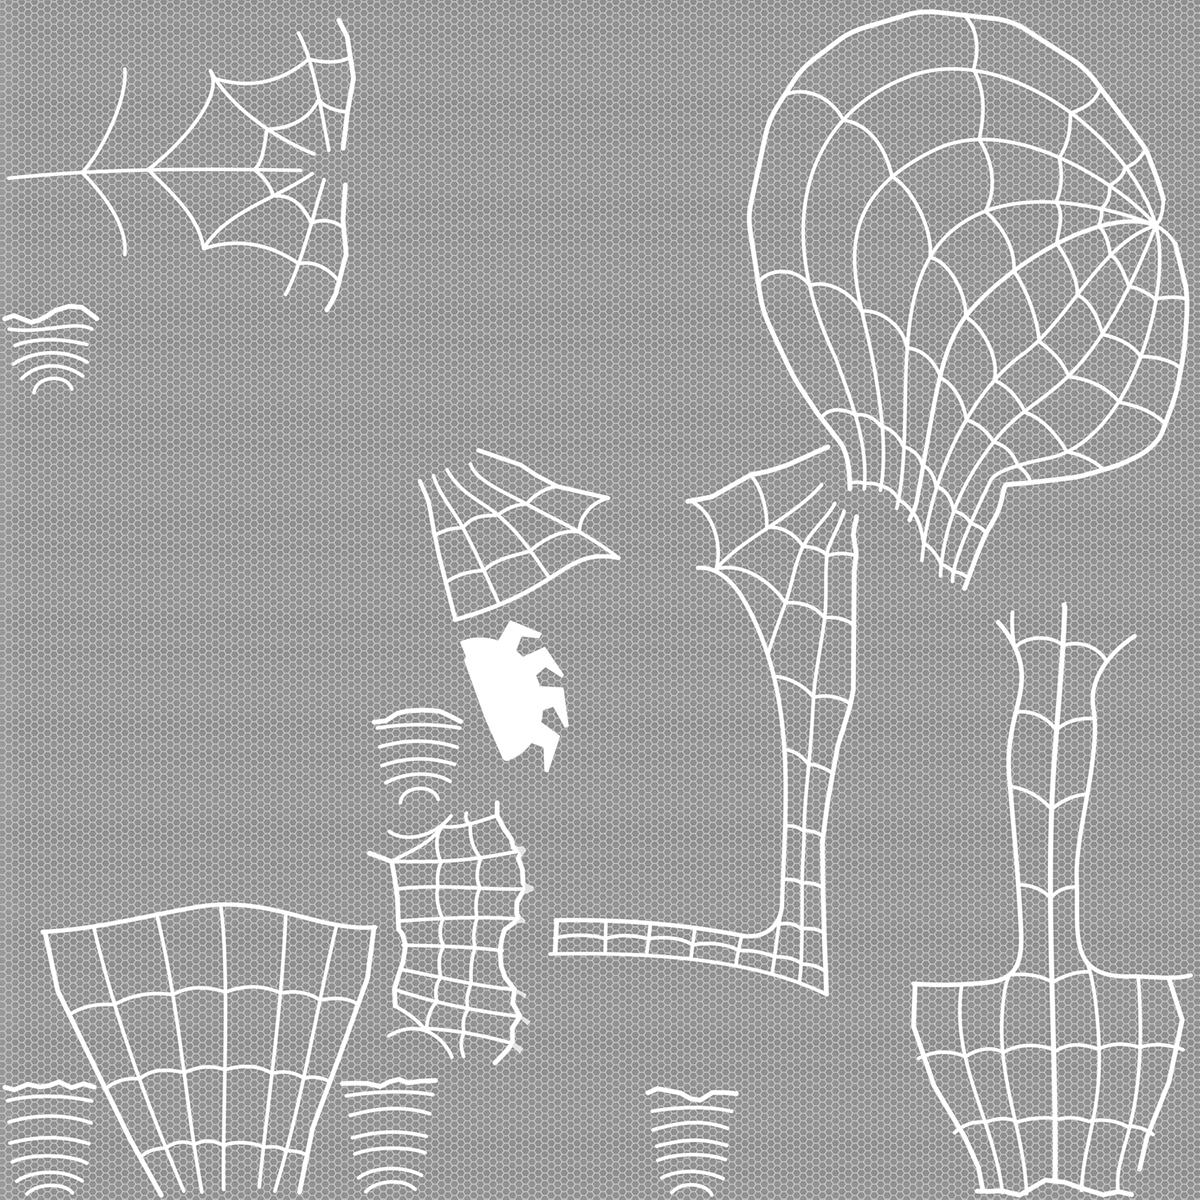 Spider-Man Super deformed on Behance